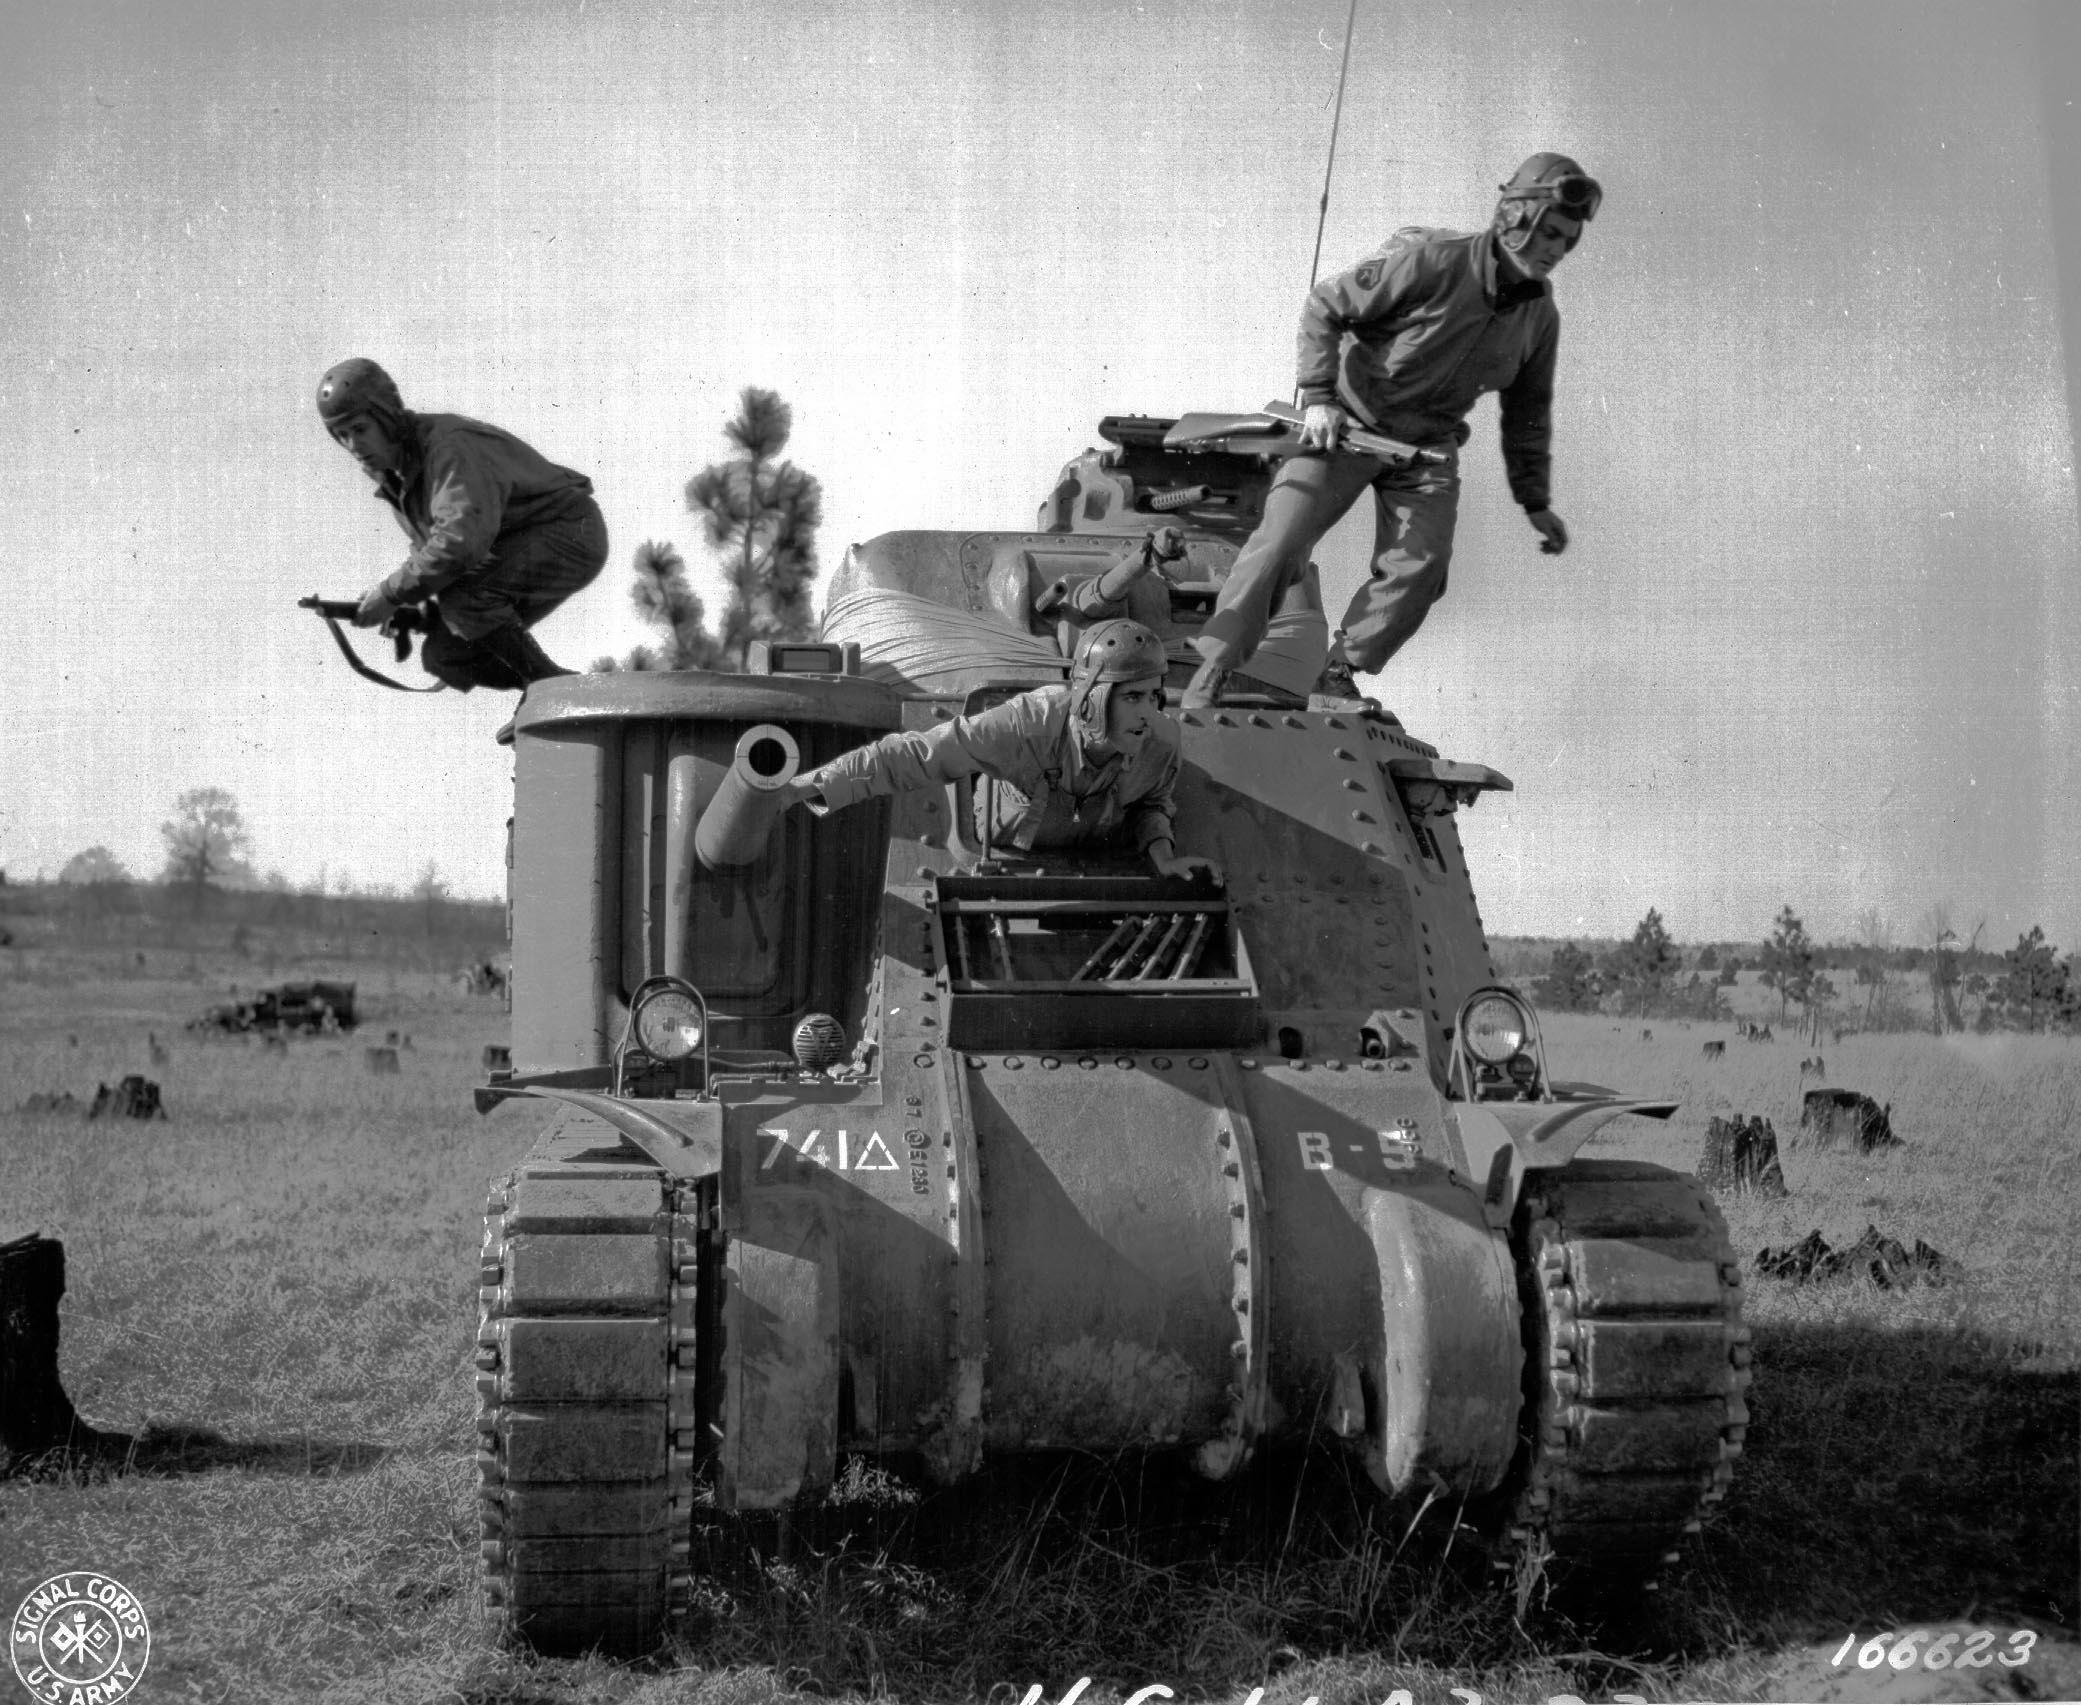 M3 crew practice abandoning their tank at Camp Polk, Louisiana. 12 Feb 1943.Co. B, 741st Tank Bn.